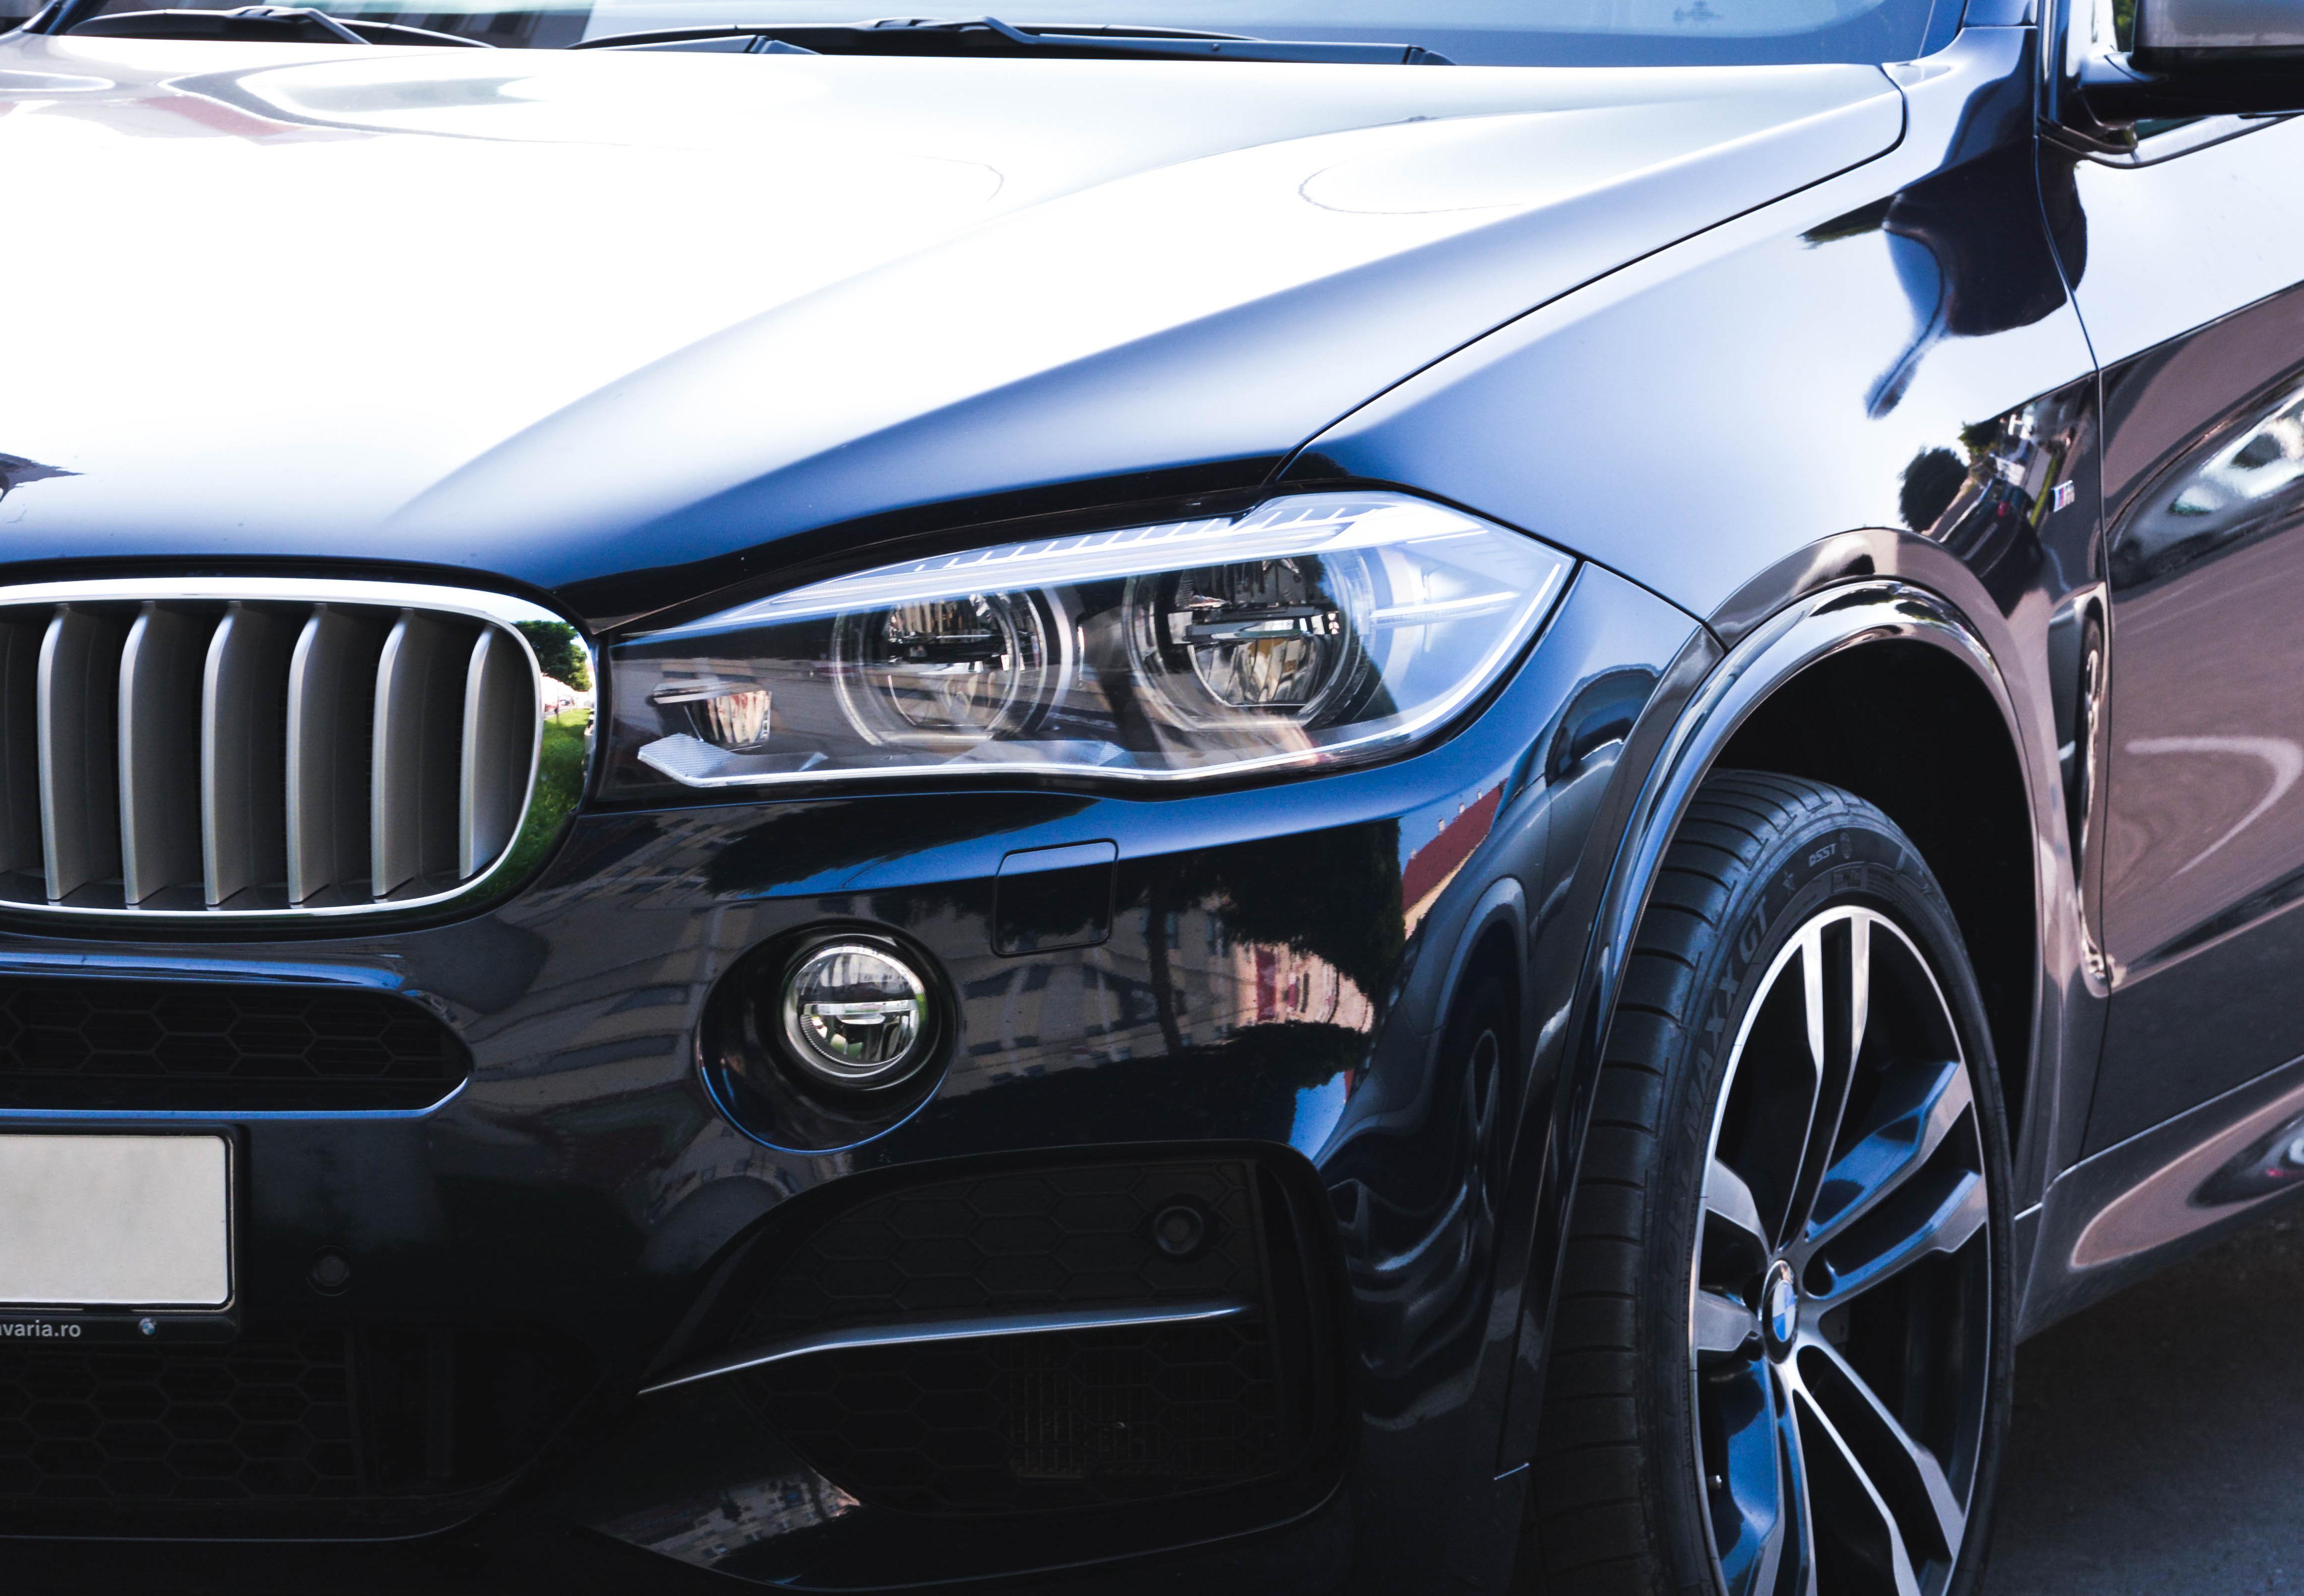 Free Stock Photo Of Black BMW Car - Black bmw car